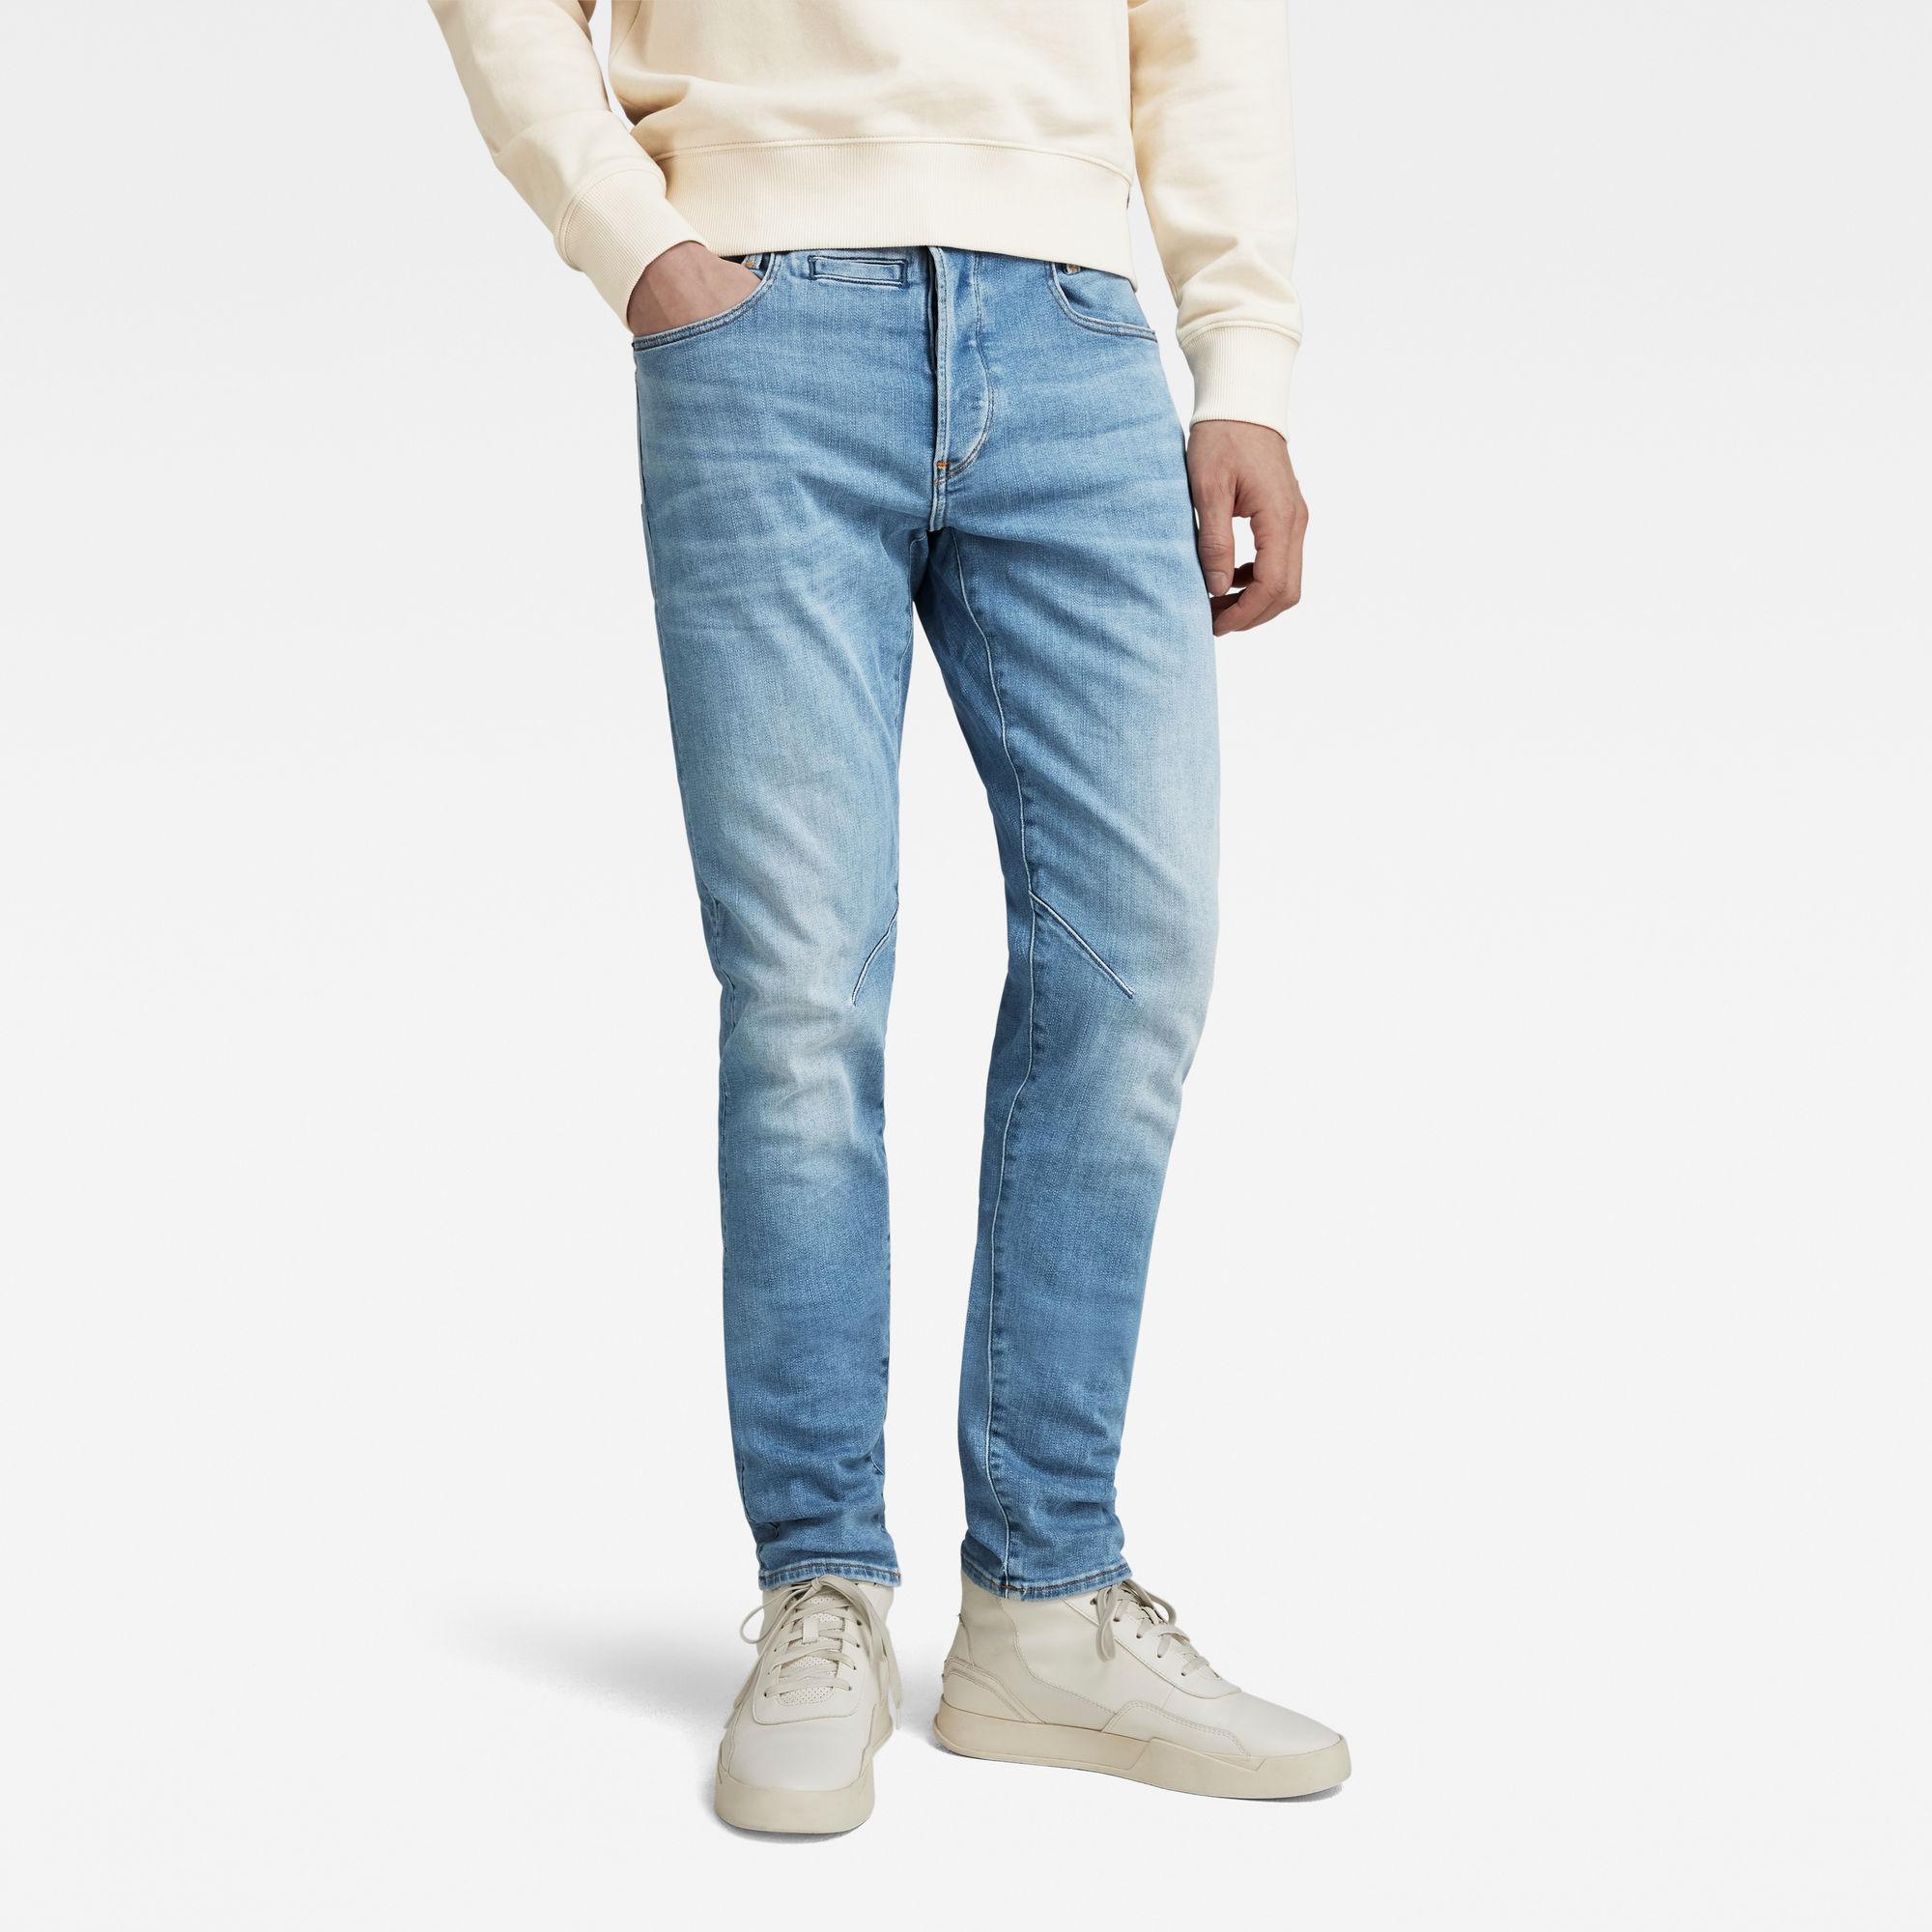 G-Star RAW Heren D-Staq 5-Pocket Slim Jeans Blauw